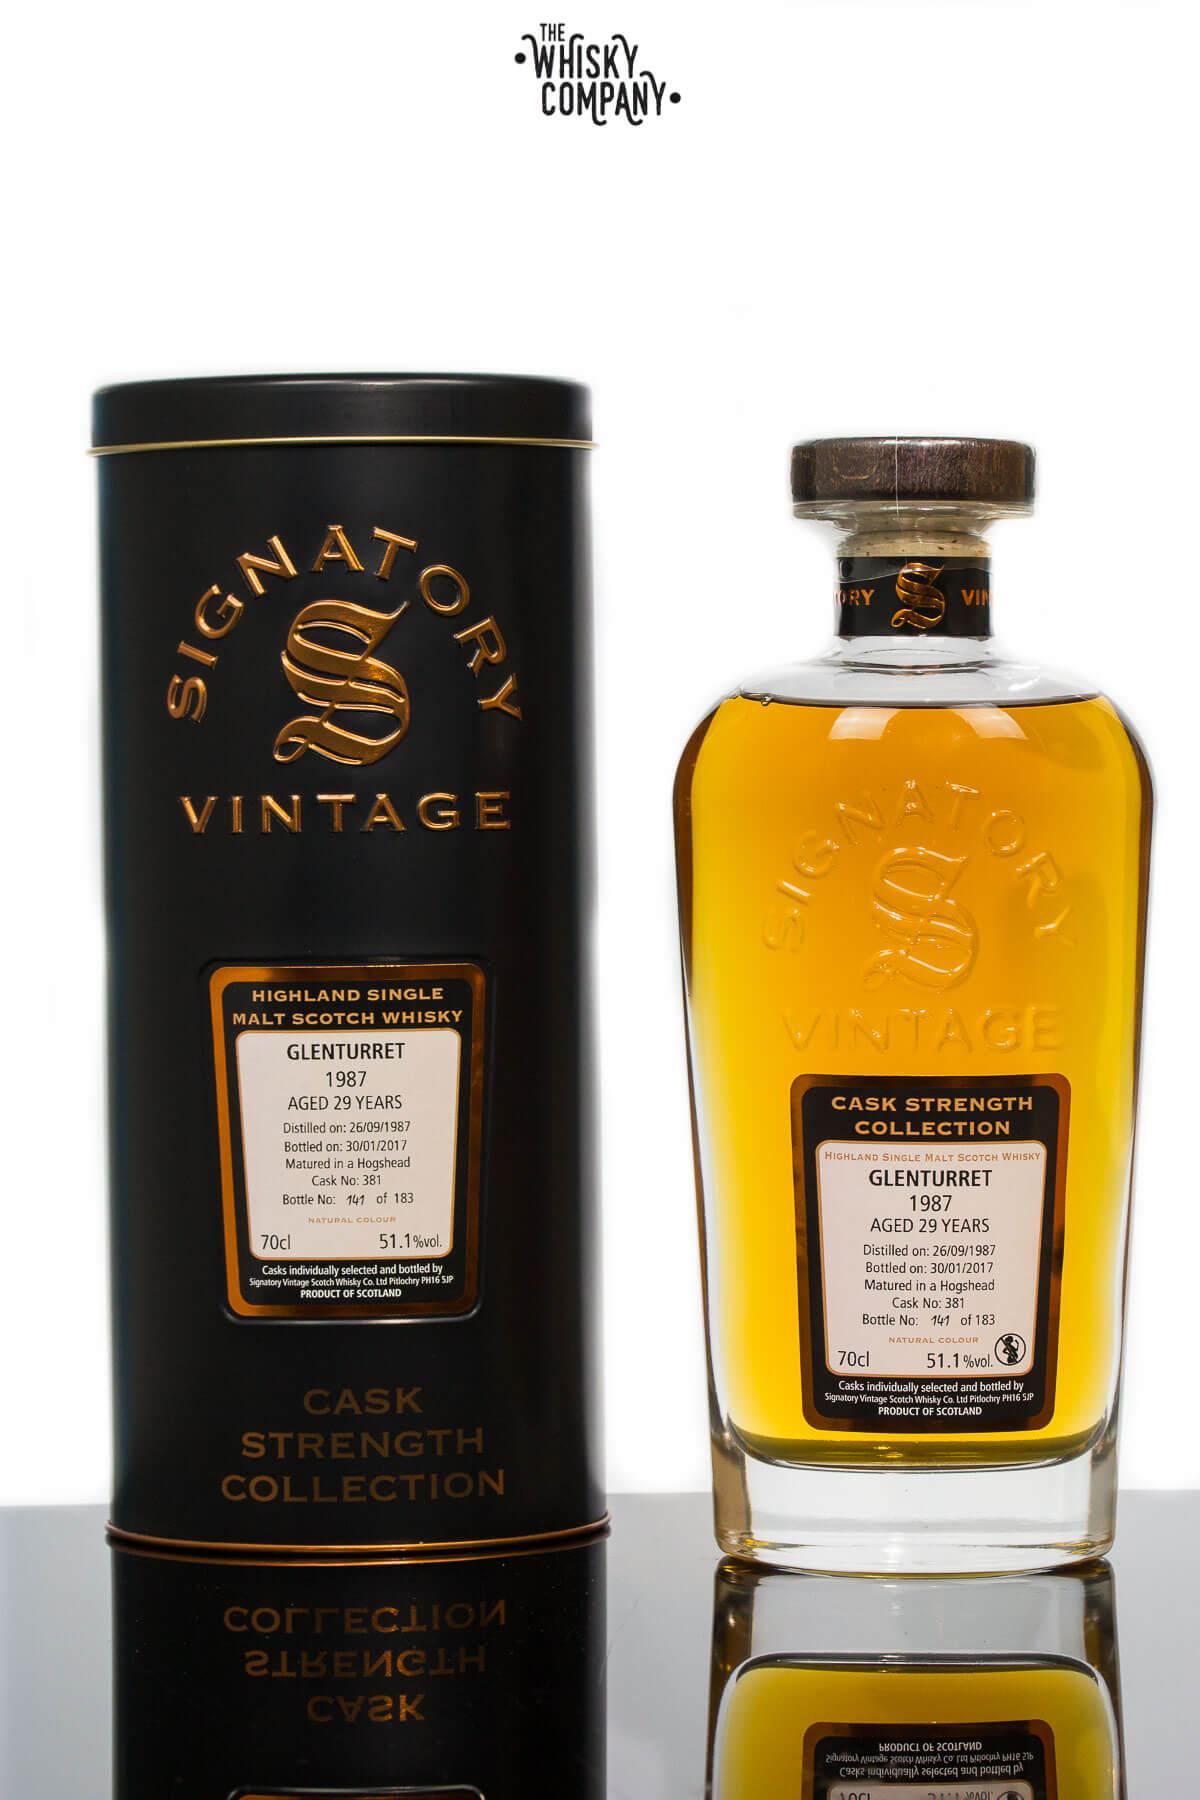 Glenturret 1987 Aged 29 Years Old (cask 381) Single Malt Scotch Whisky - Signatory Vintage (700ml)